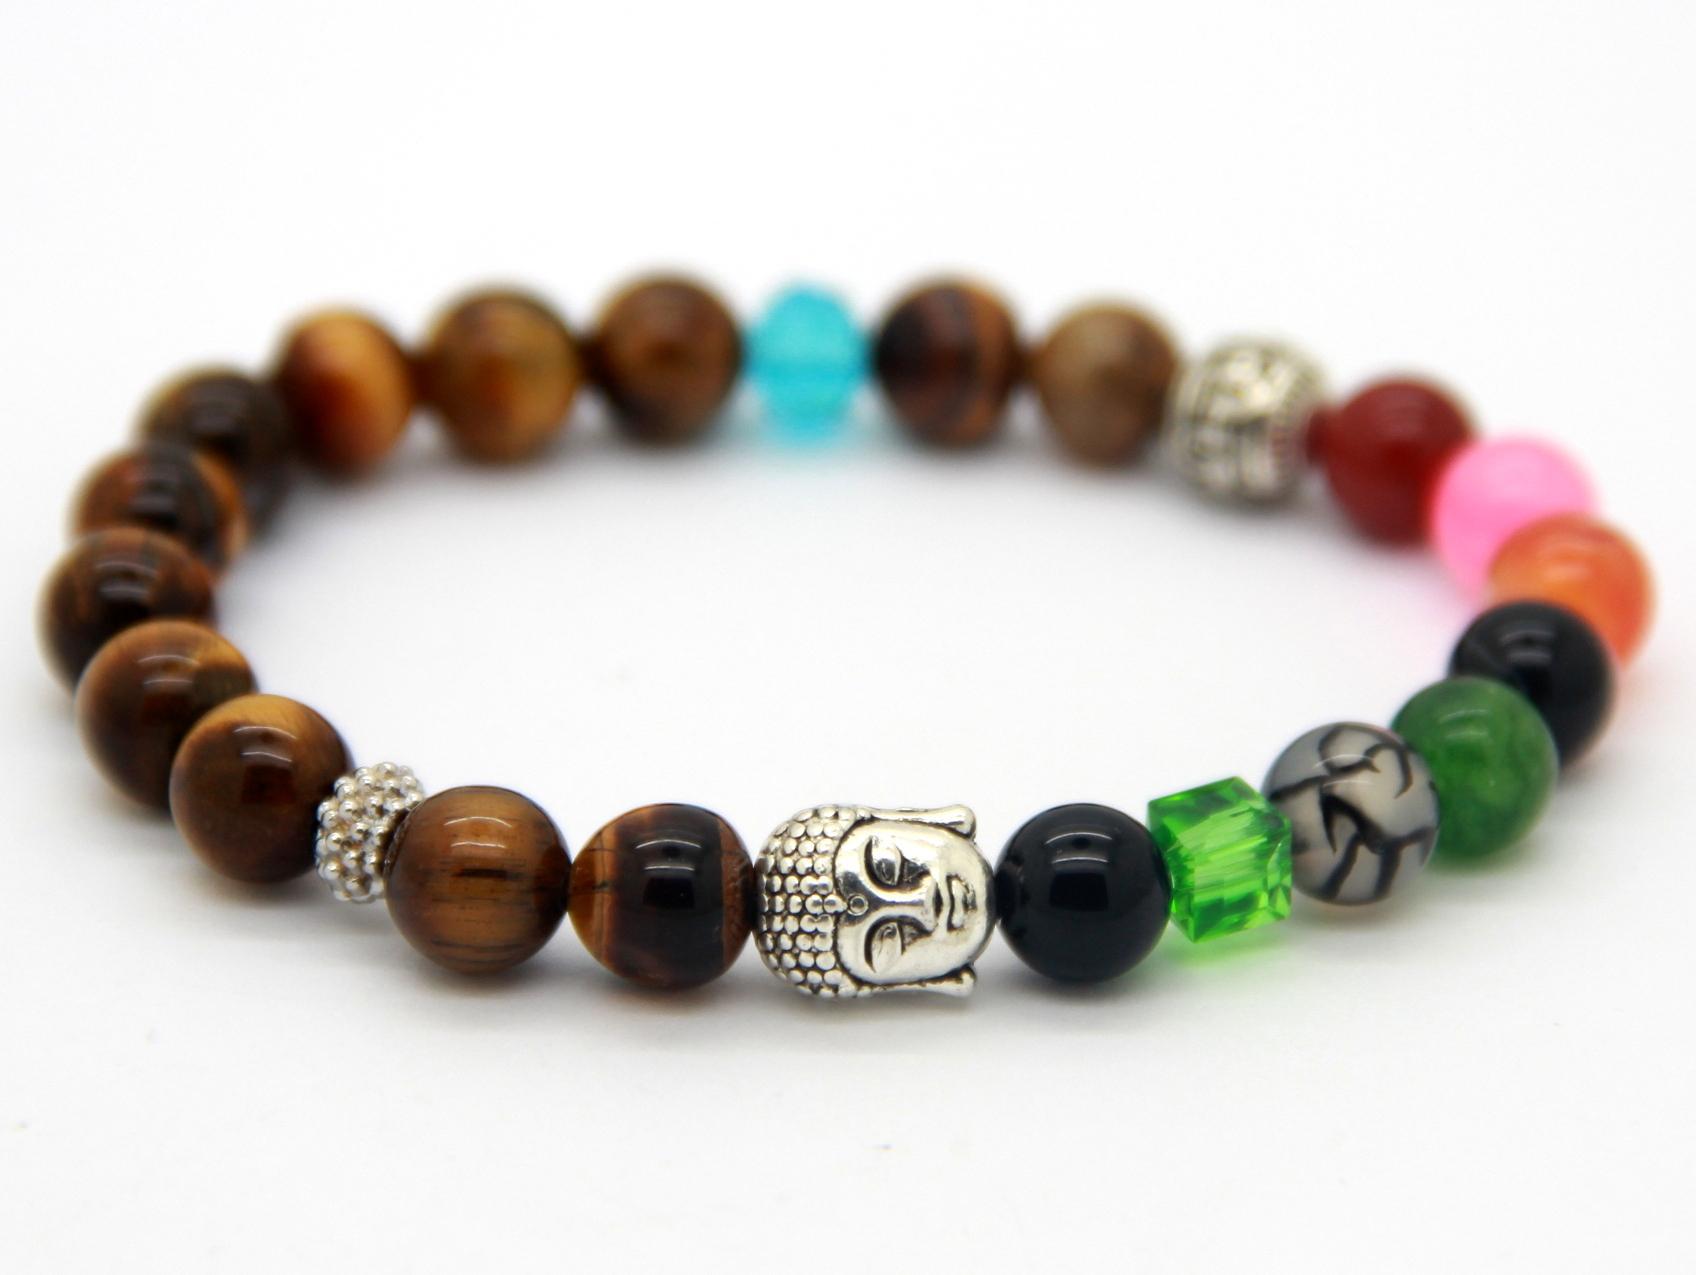 Whosale Ny Design Beaded Mäns Silver Buddha Armband med Naturlig Tiger Eye Stone Pärlor Yoga Armband